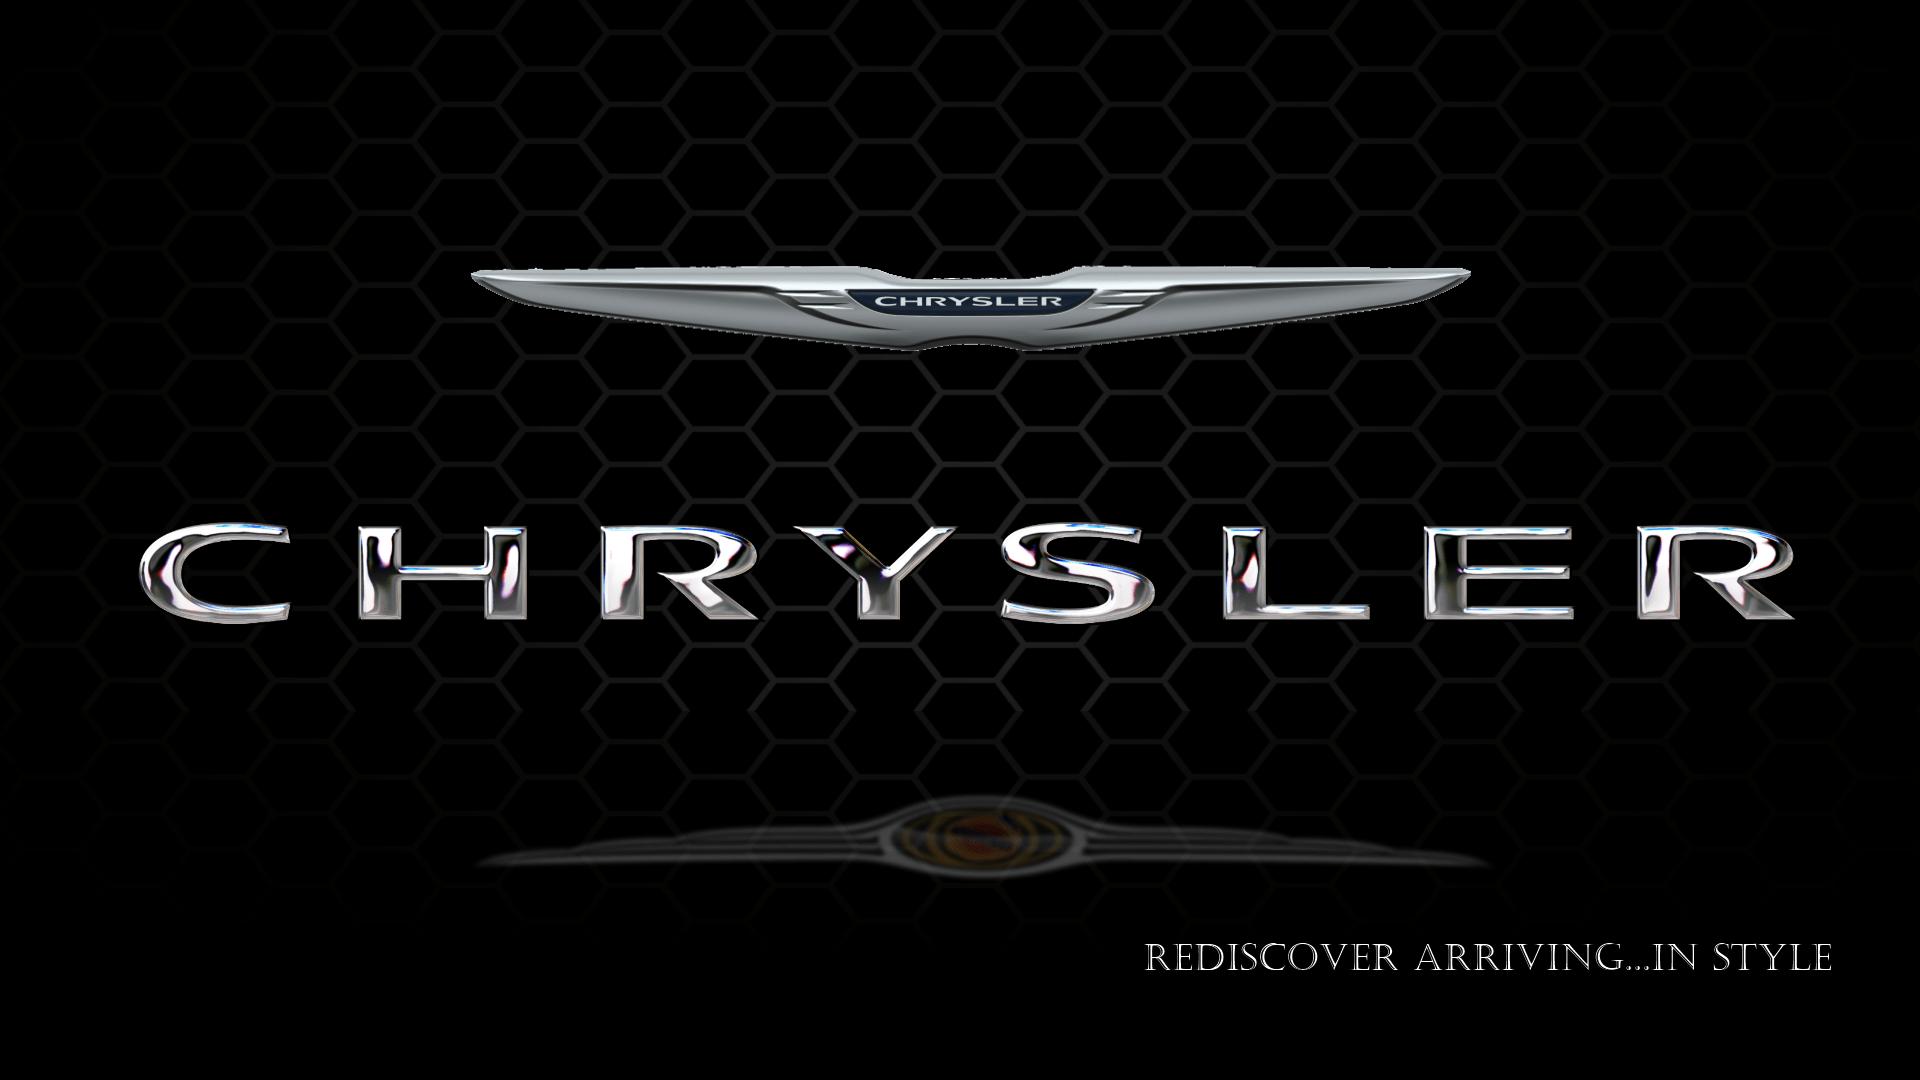 Chrysler Wallpapers Top Free Chrysler Backgrounds Wallpaperaccess